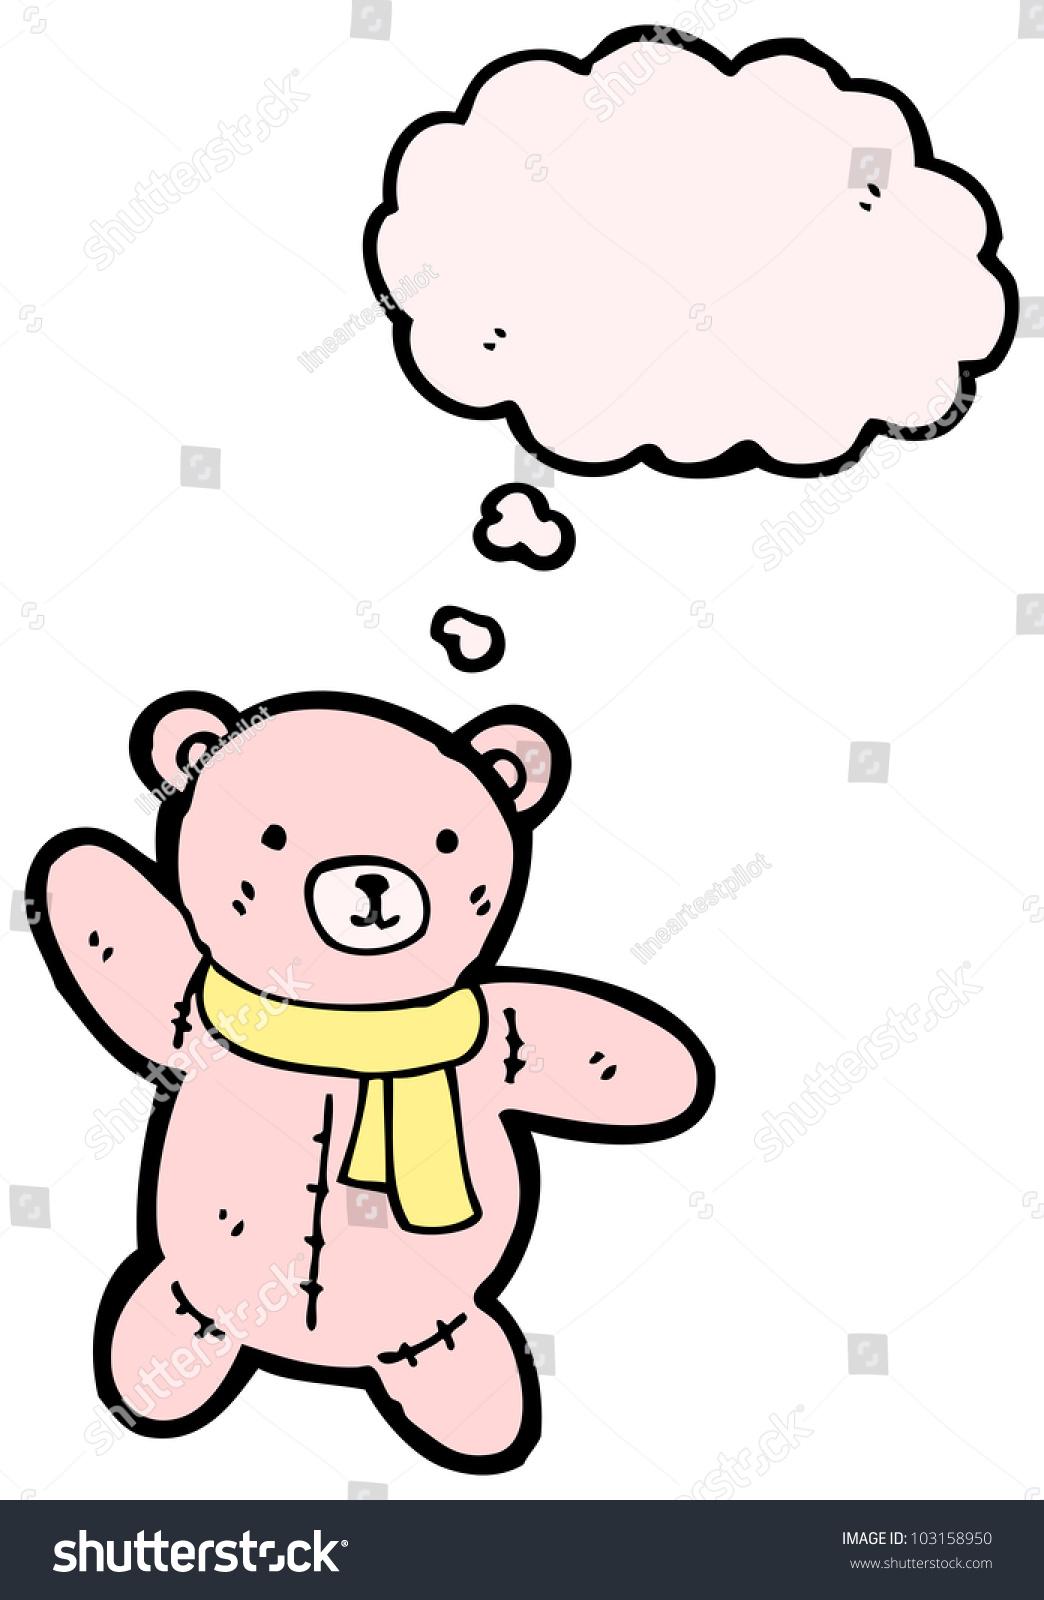 Pink Teddy Bear Stock Photos and Images  123rfcom